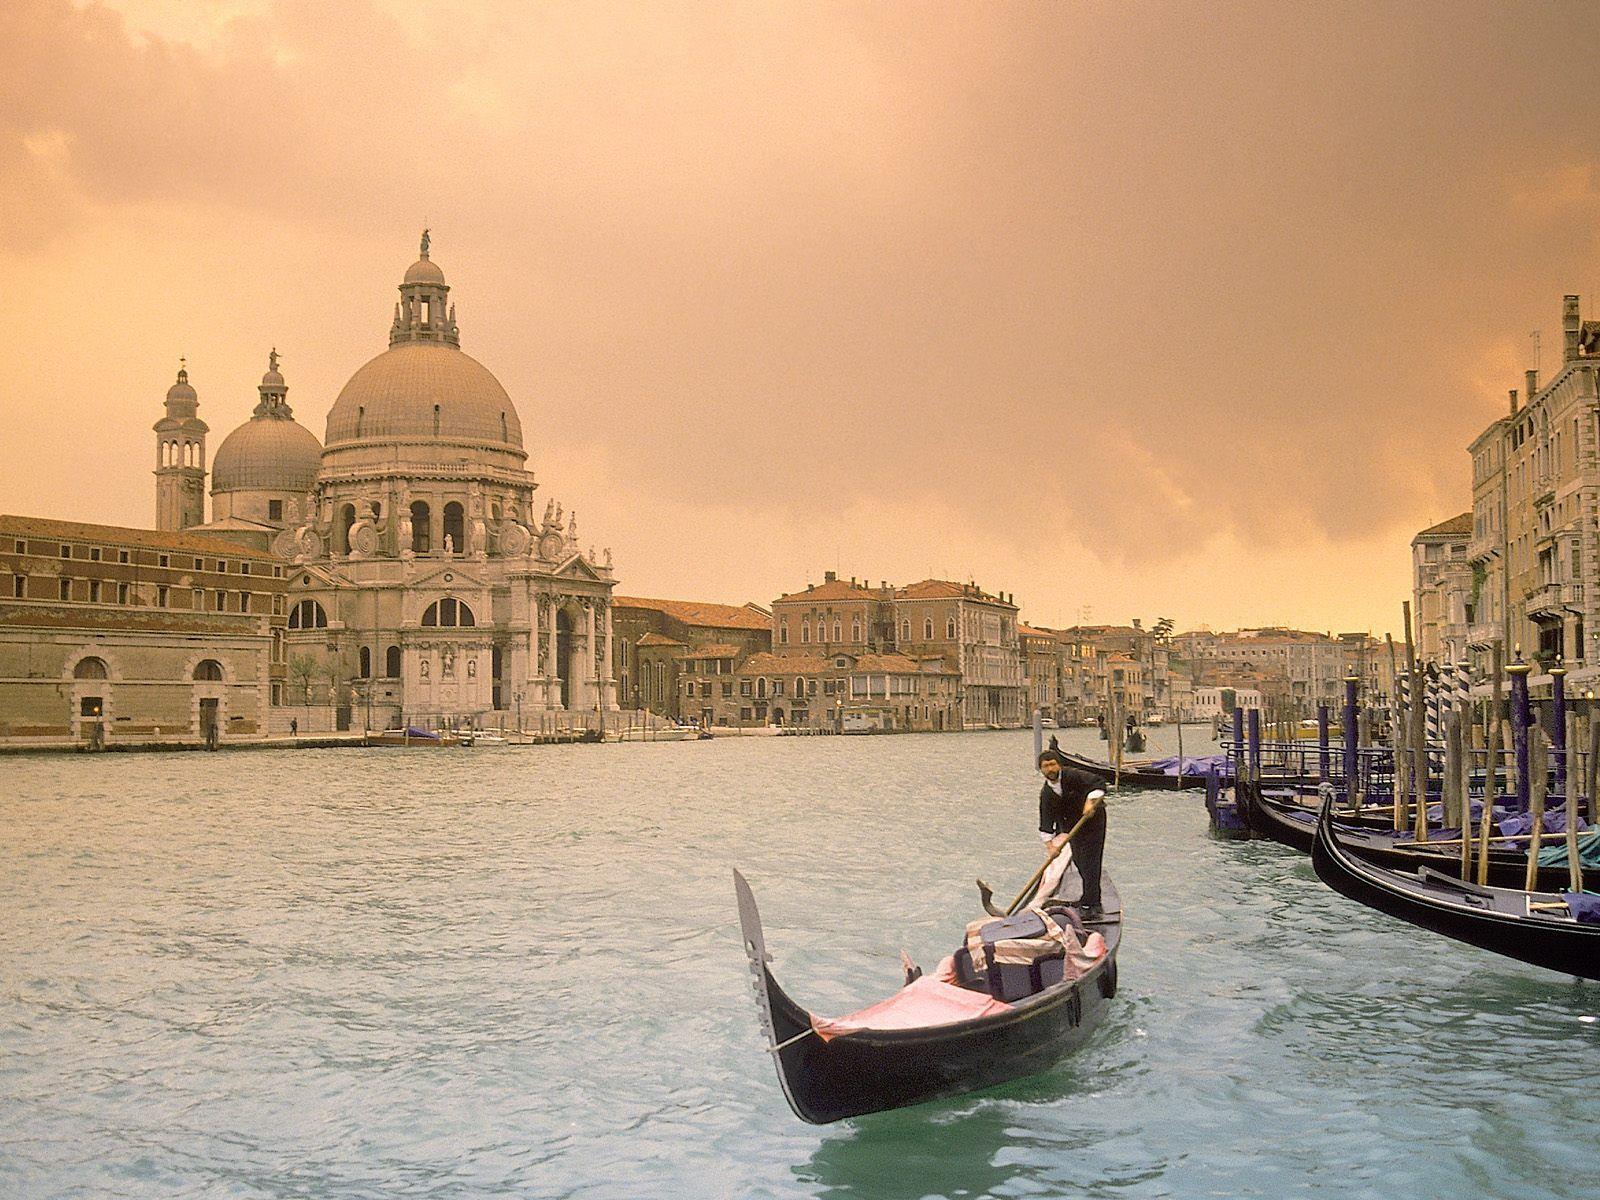 My favorite Italian city